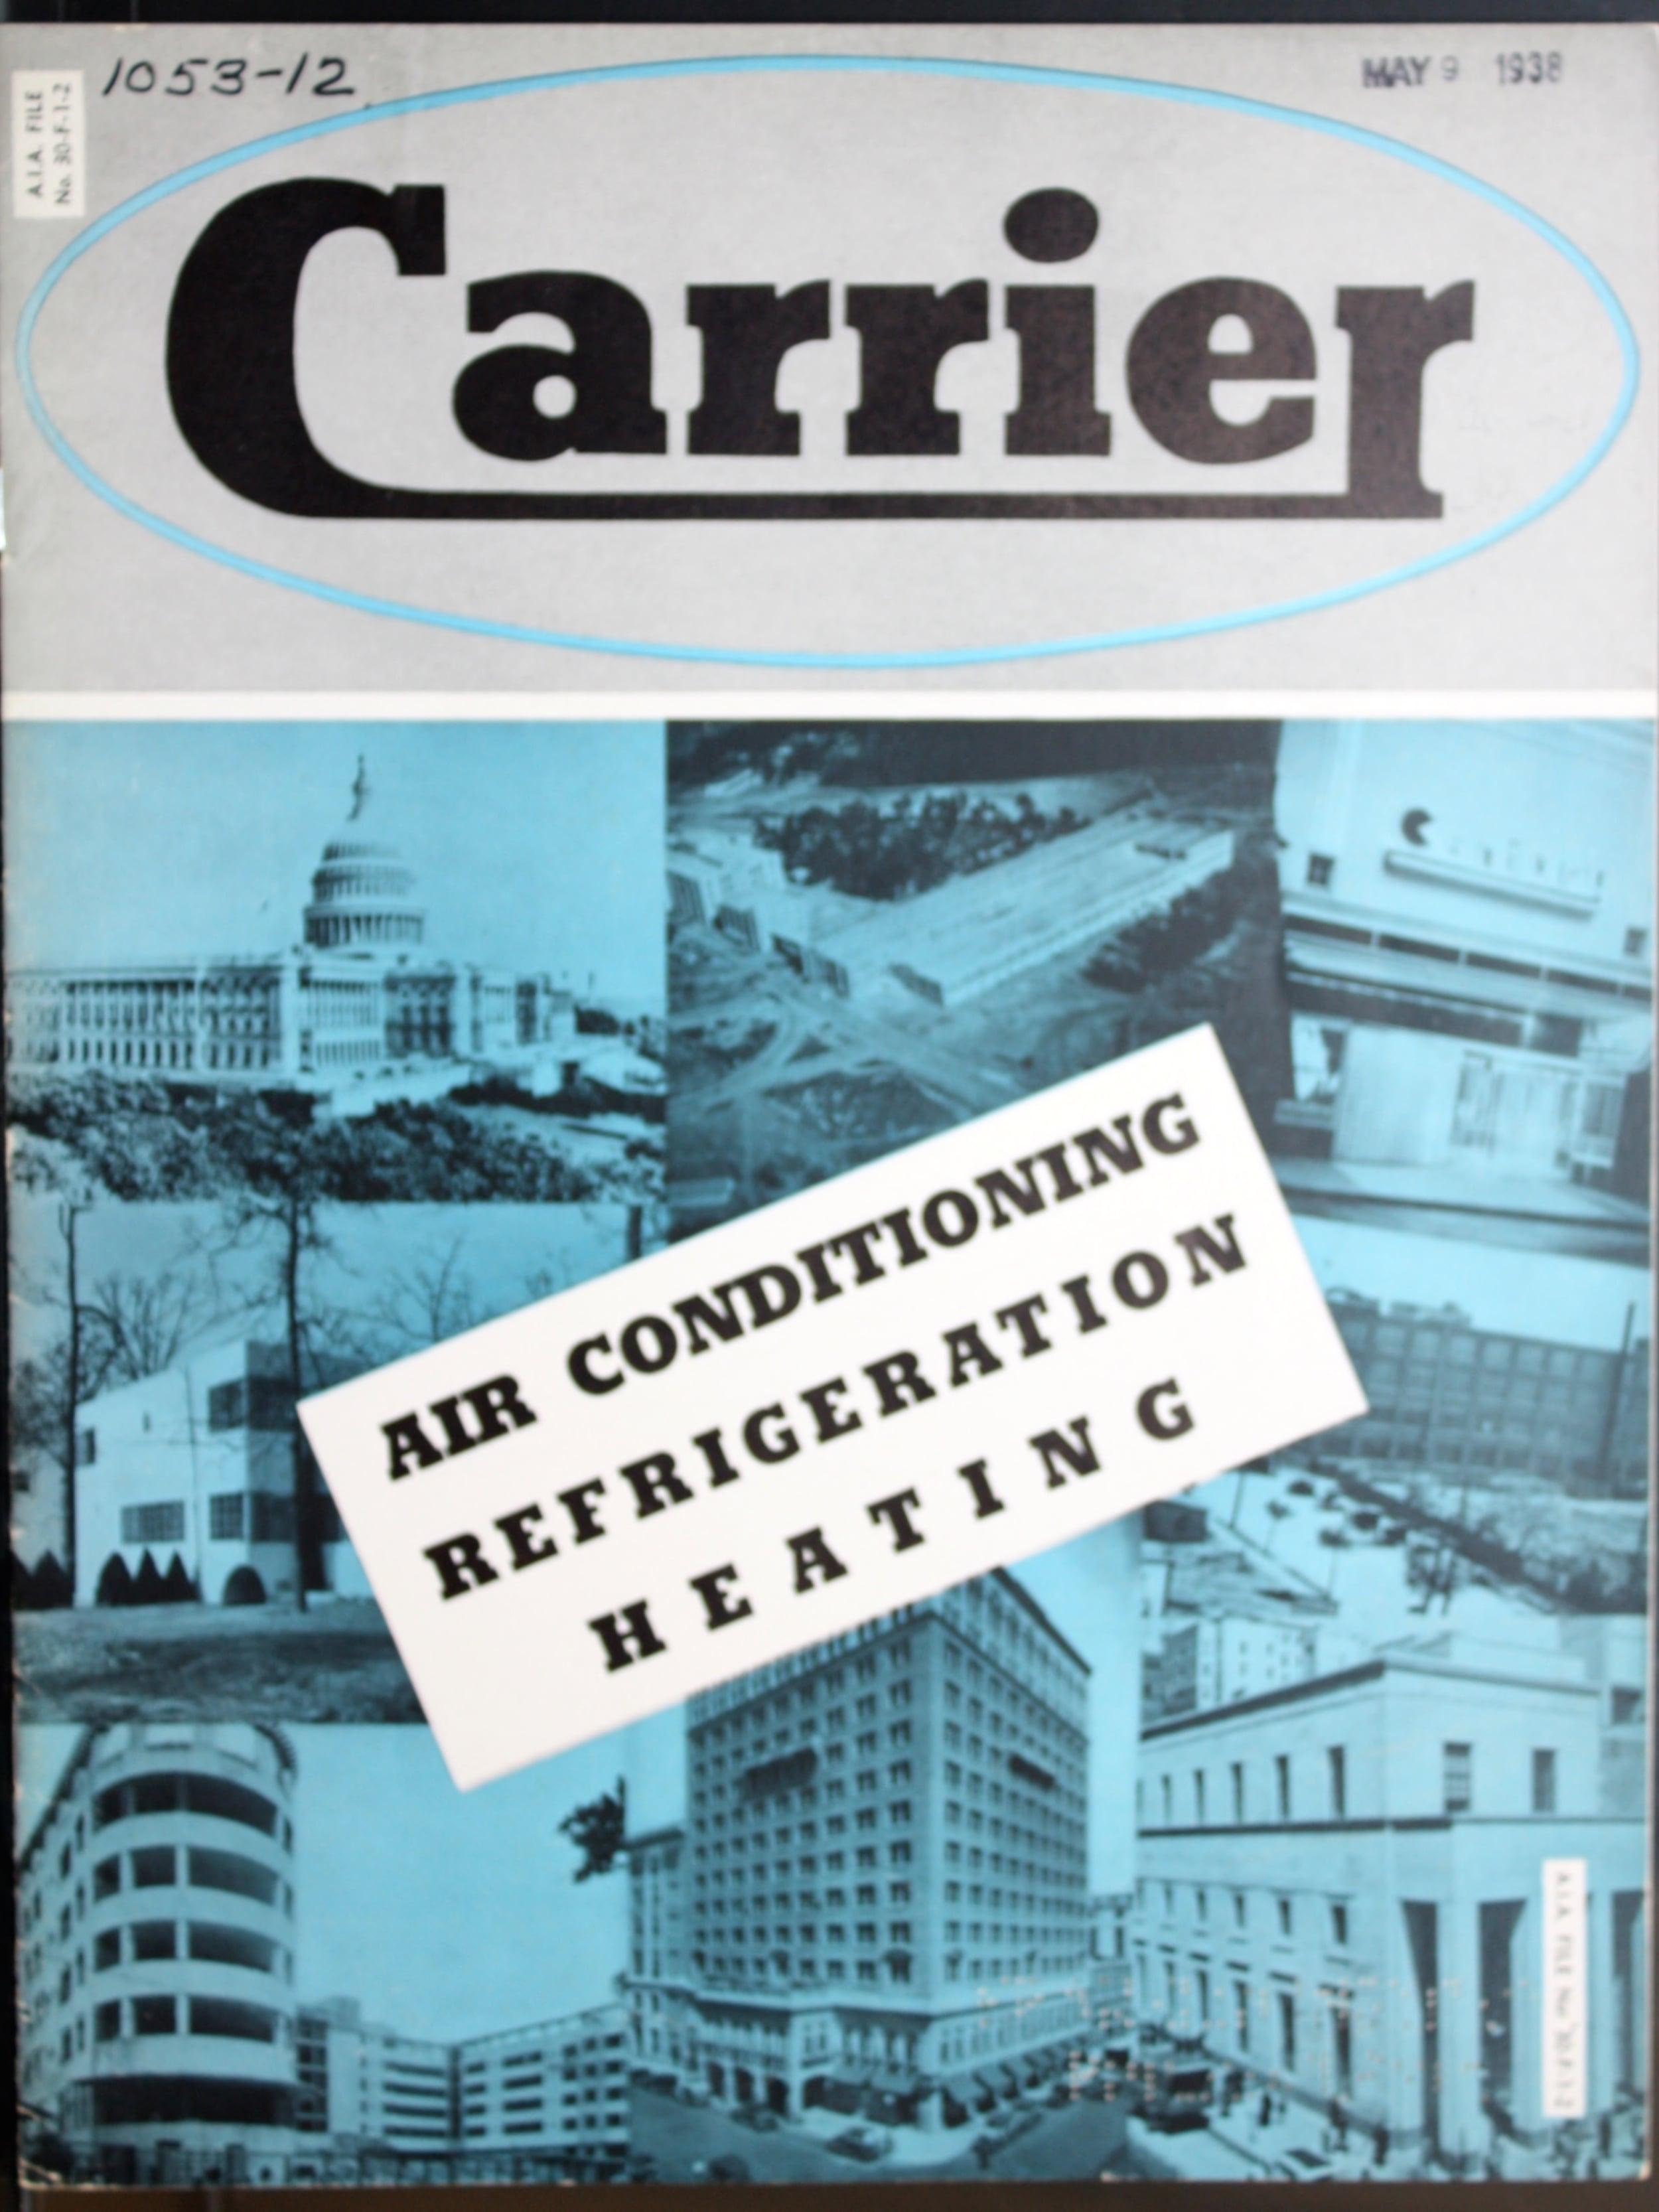 CarrierCca42790_0000.jpg